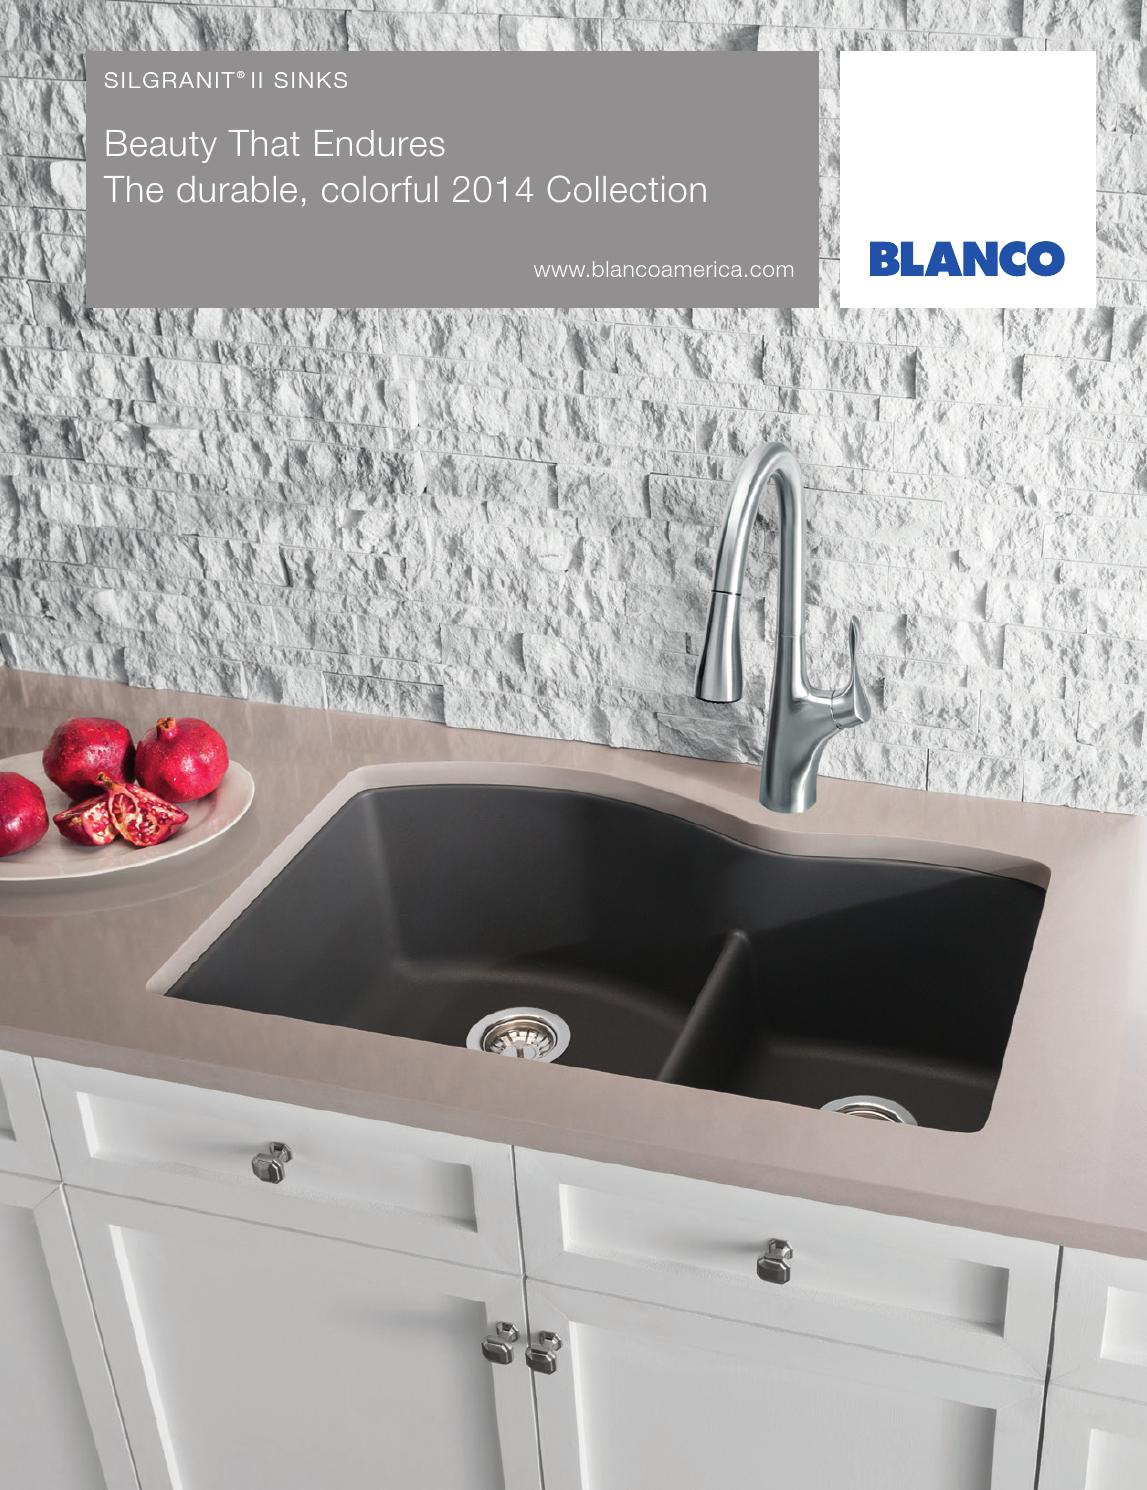 Attirant BLANCO 2014 SILGRANIT Sink Brochure By BLANCO   Issuu